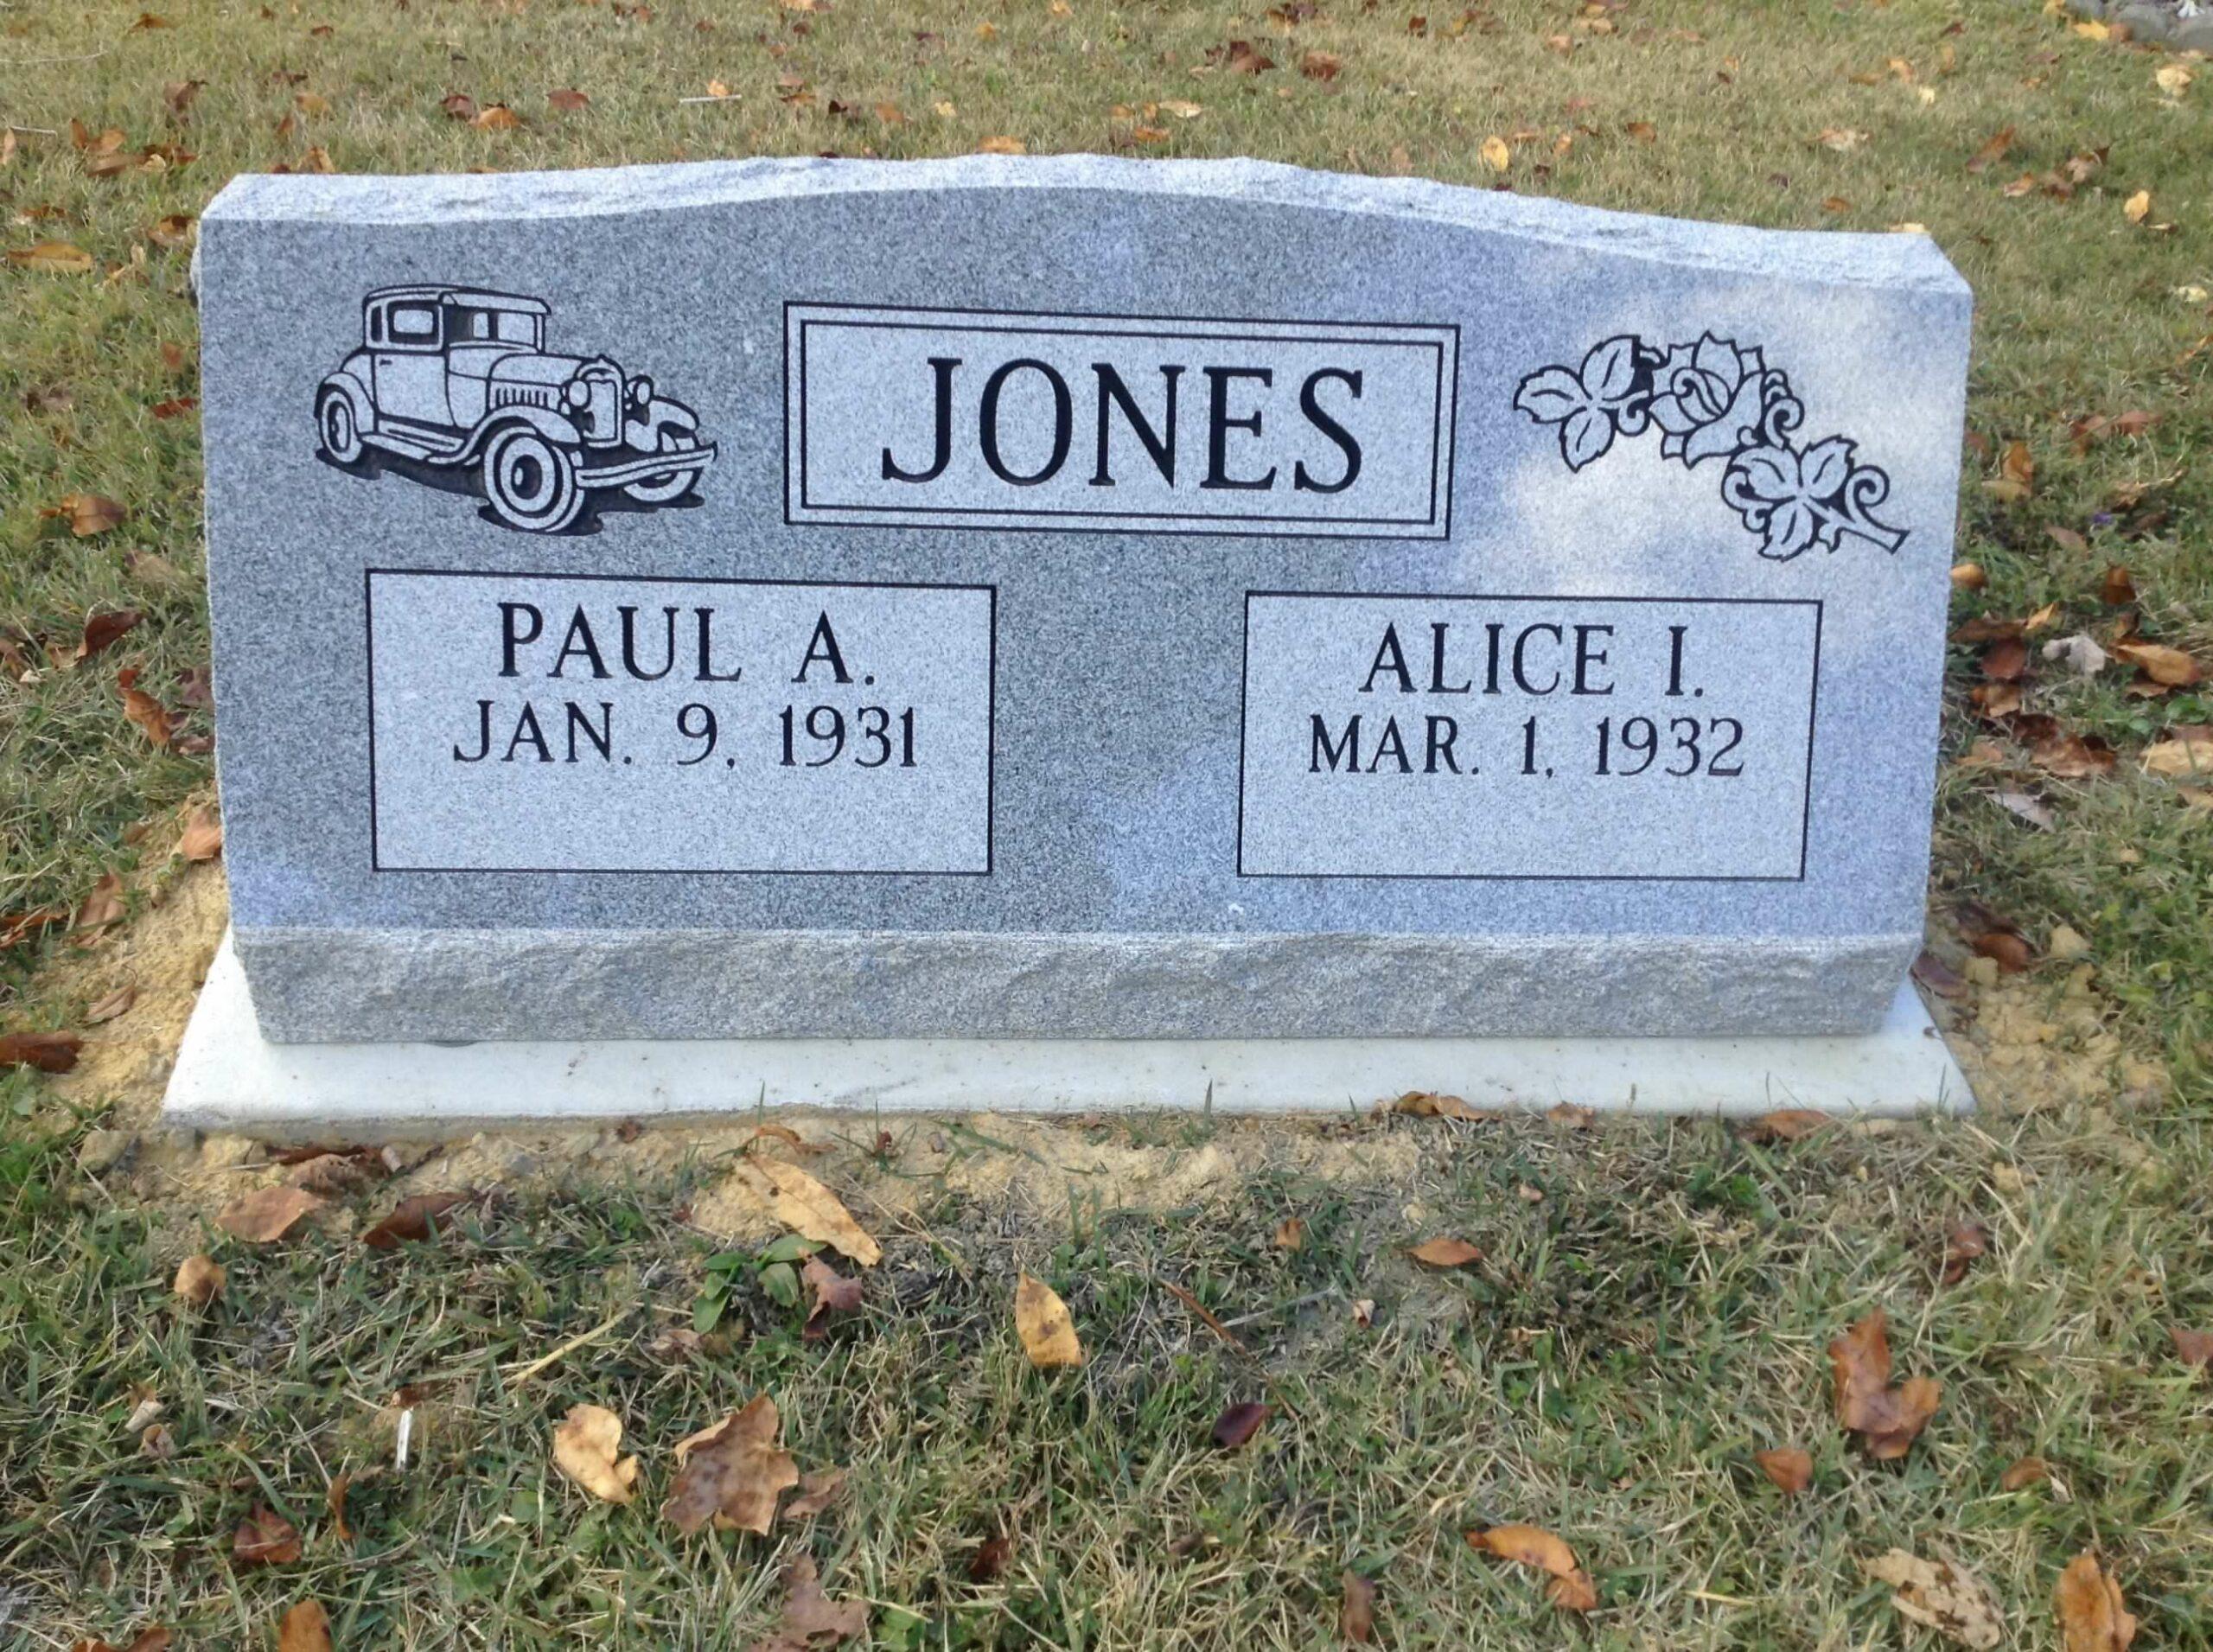 Jones, Paul